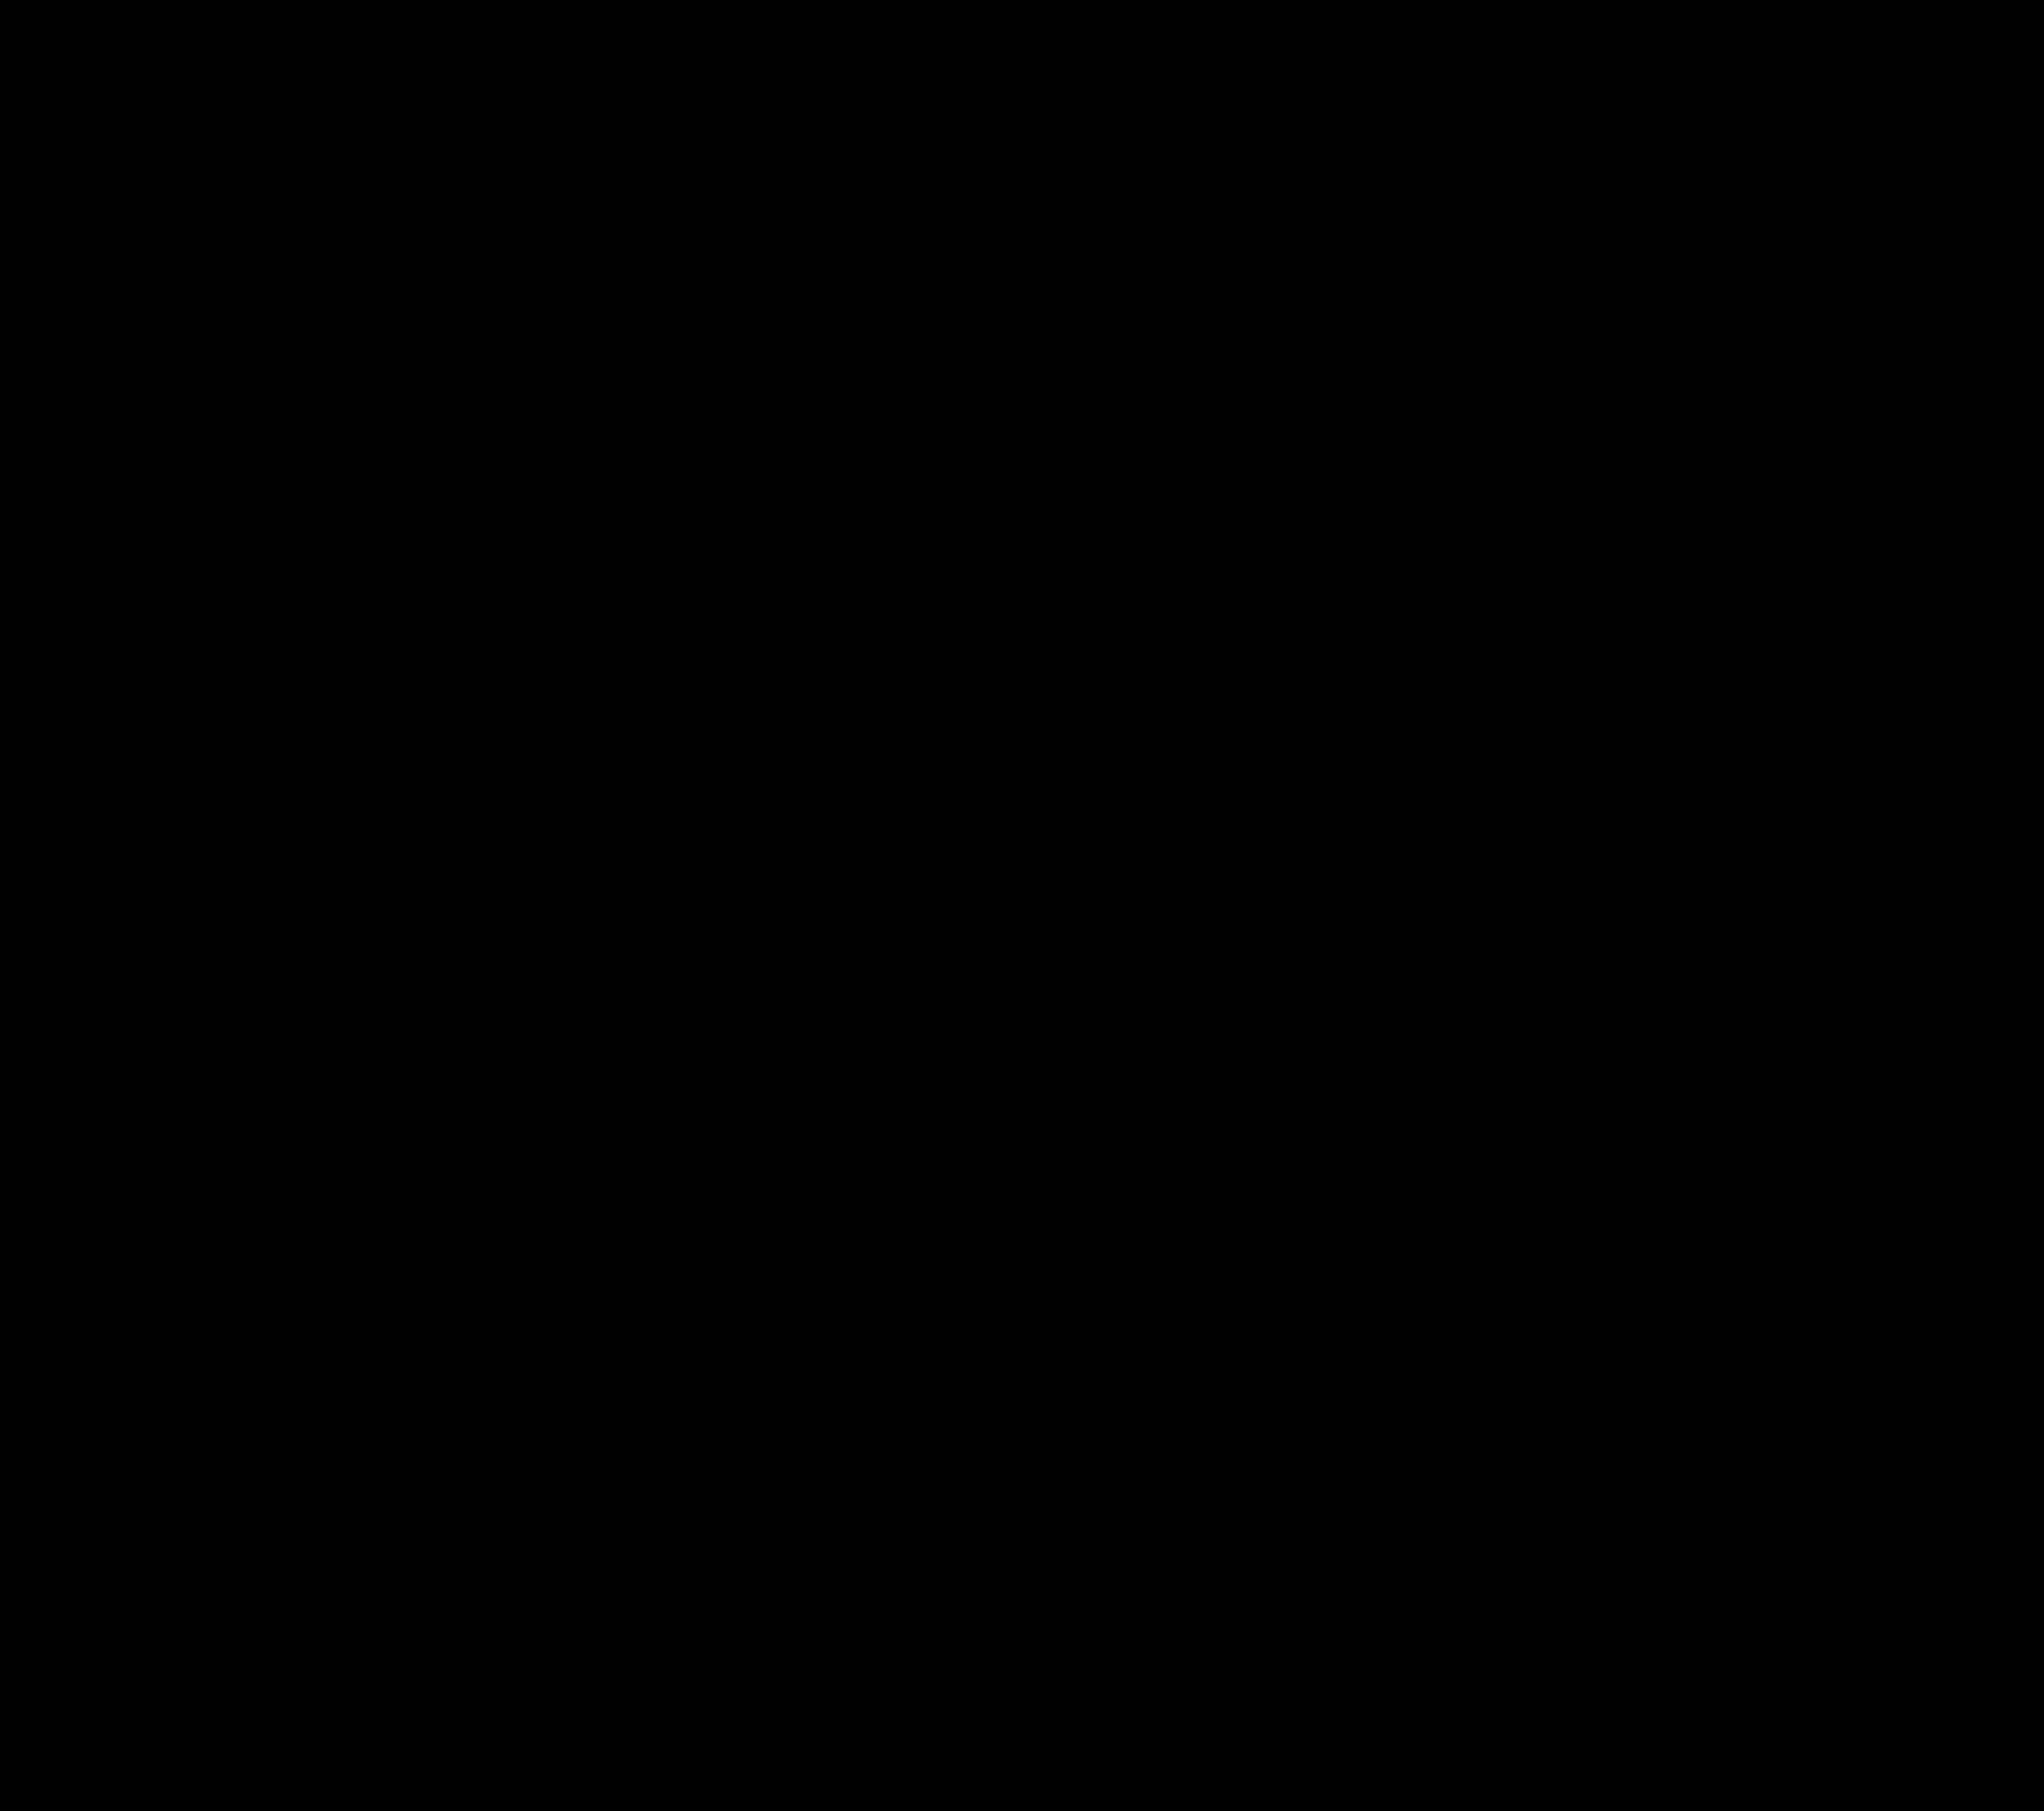 griscuarzo